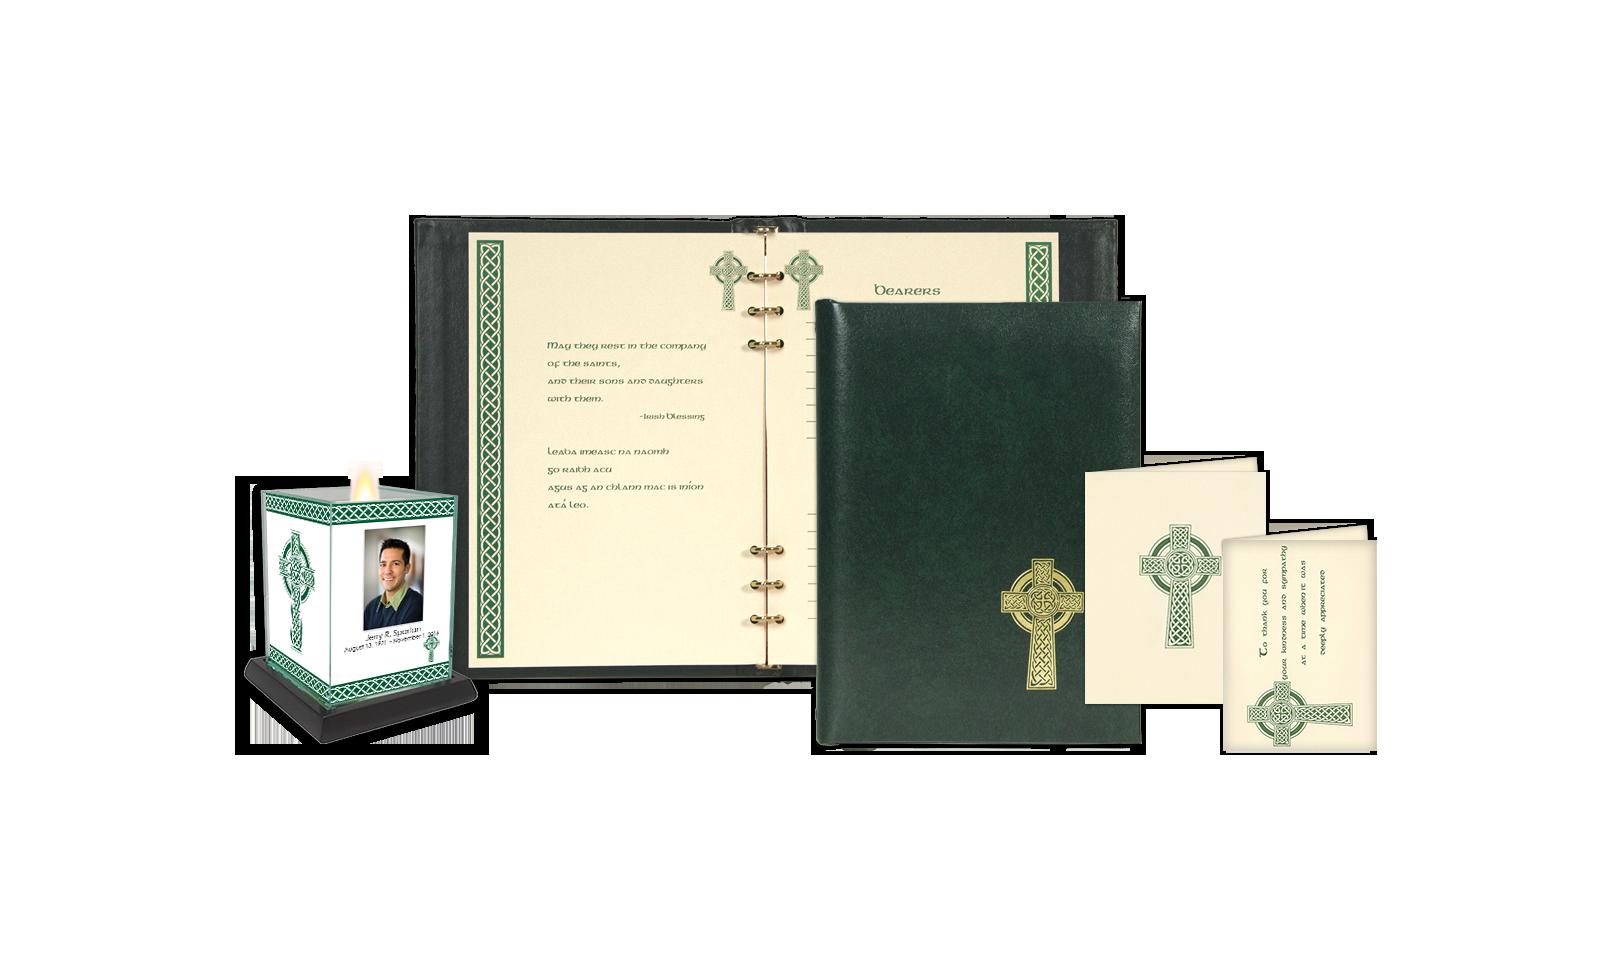 ROL Celtic Cross Series 331 IR